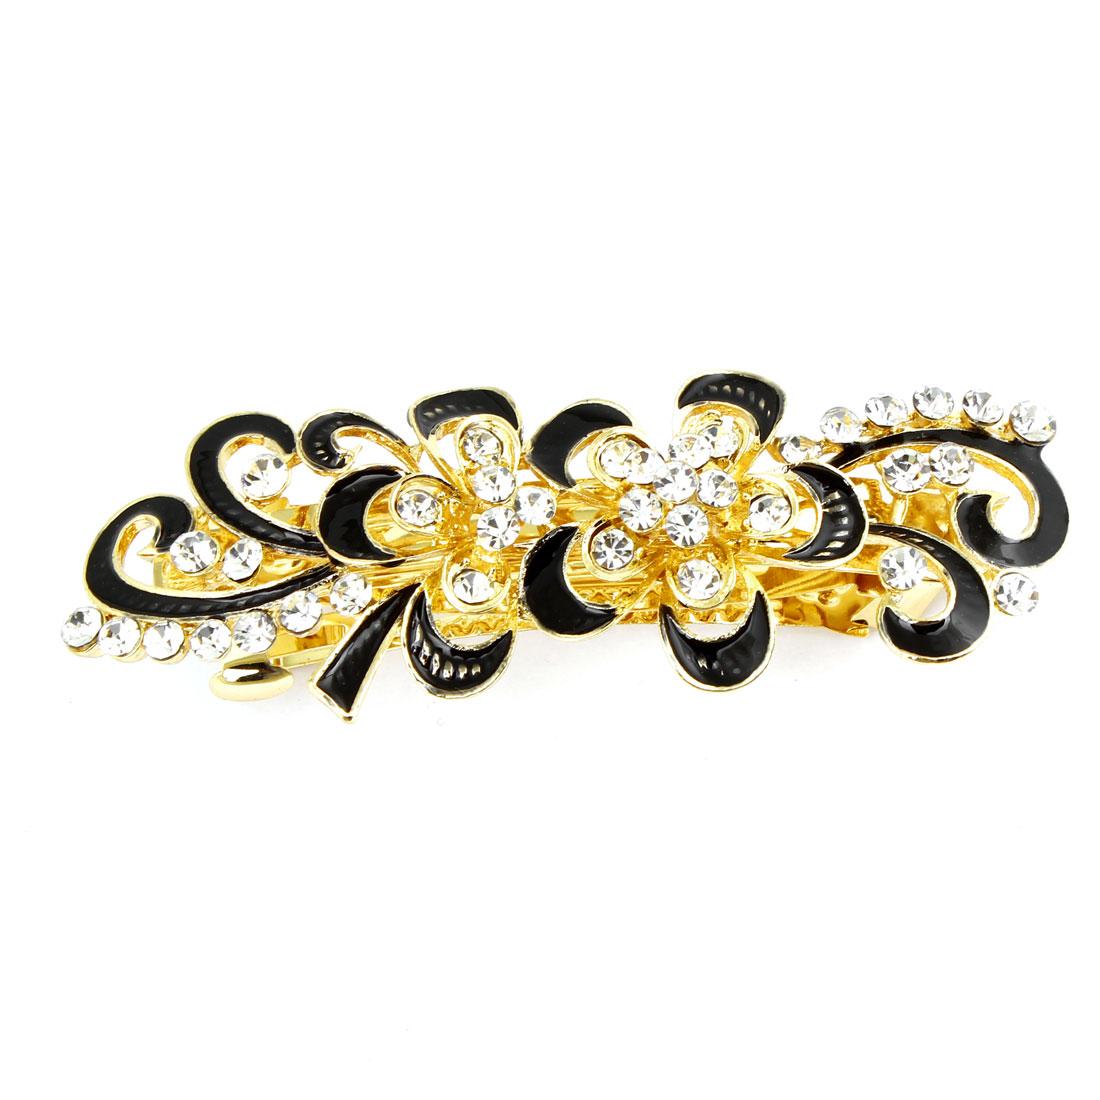 Shiny Rhinestones Detail Black Swirl Flower Hairclip French Clip